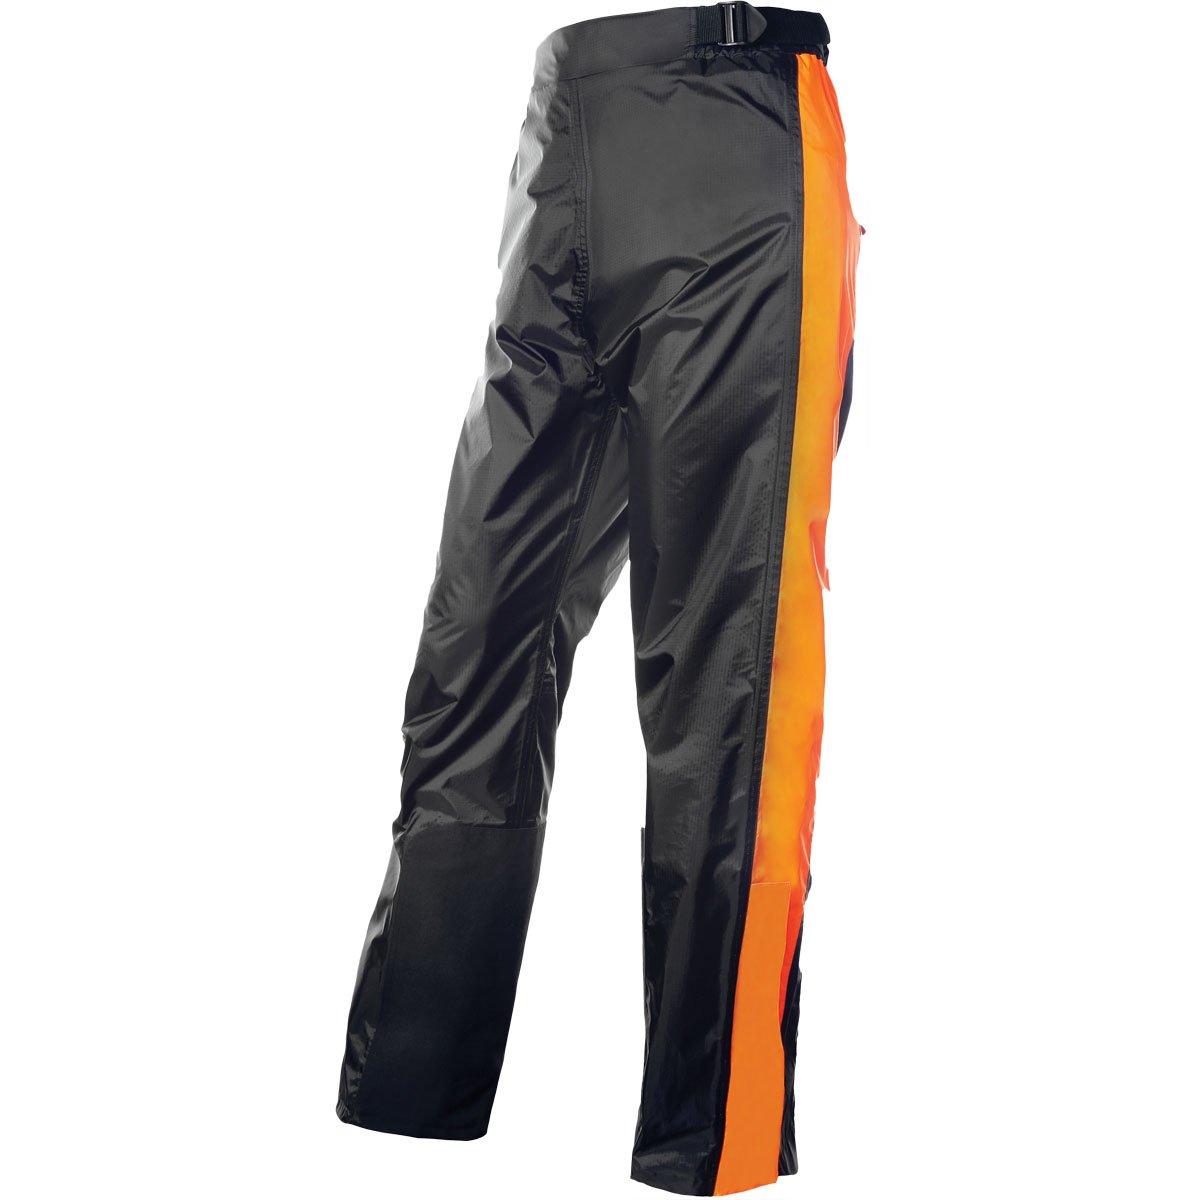 Olympia Horizon Adult Rain Pant Street Motorcycle Rain Suit - Black/Neon Orange/X-Large/2X-Large